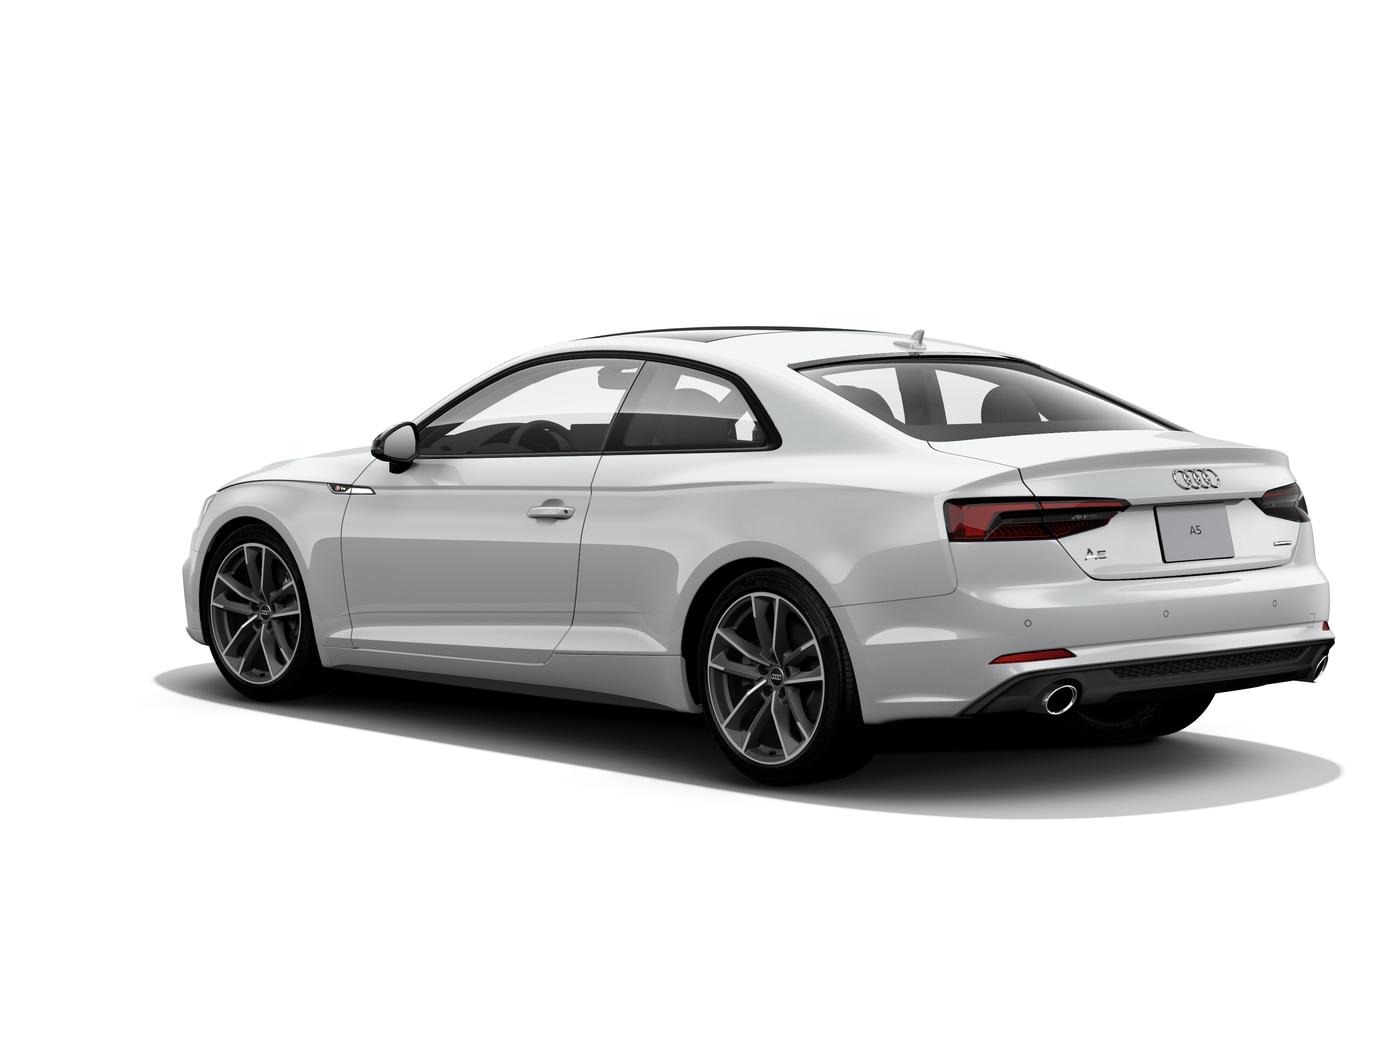 New 2019 Audi A5 For Sale in Carlsbad CA | WAUTNAF5XKA012741